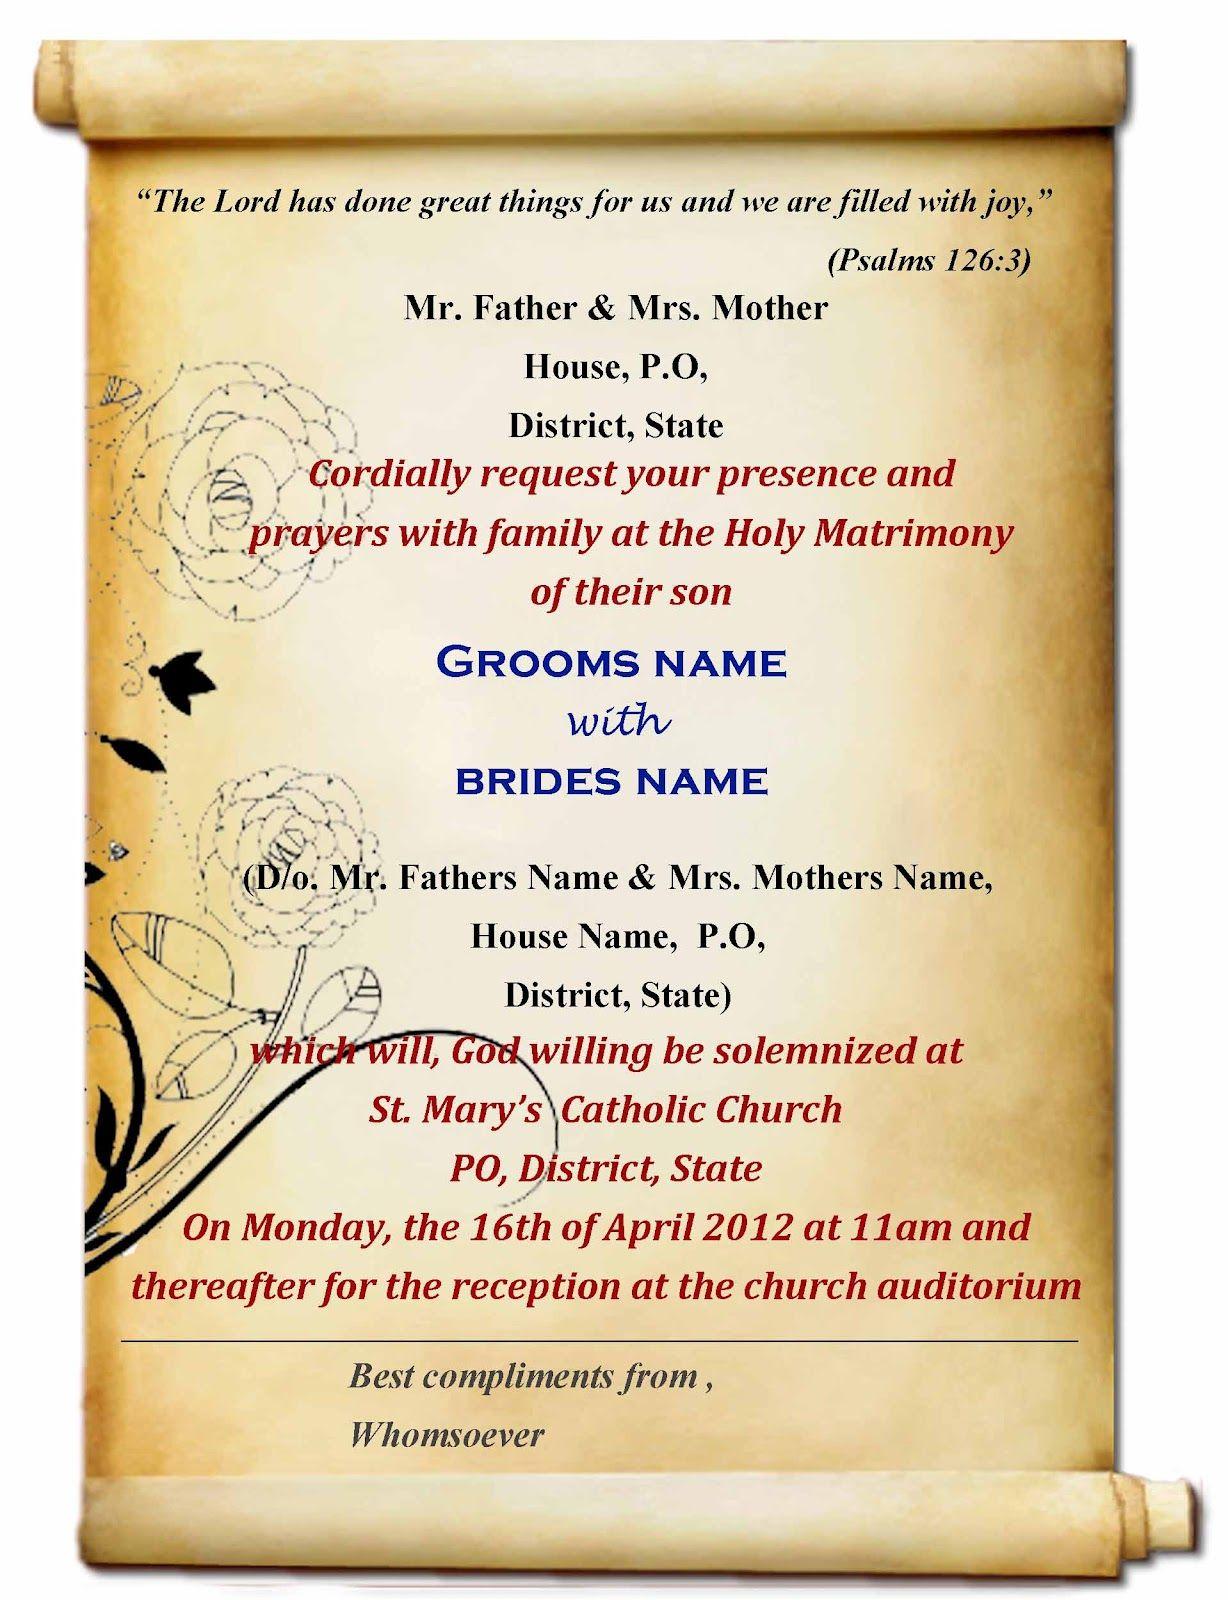 Indian-Wedding-Invitation-Cards-Templates-Free-Download-10 | Jaimon - Free Printable Wedding Scrolls